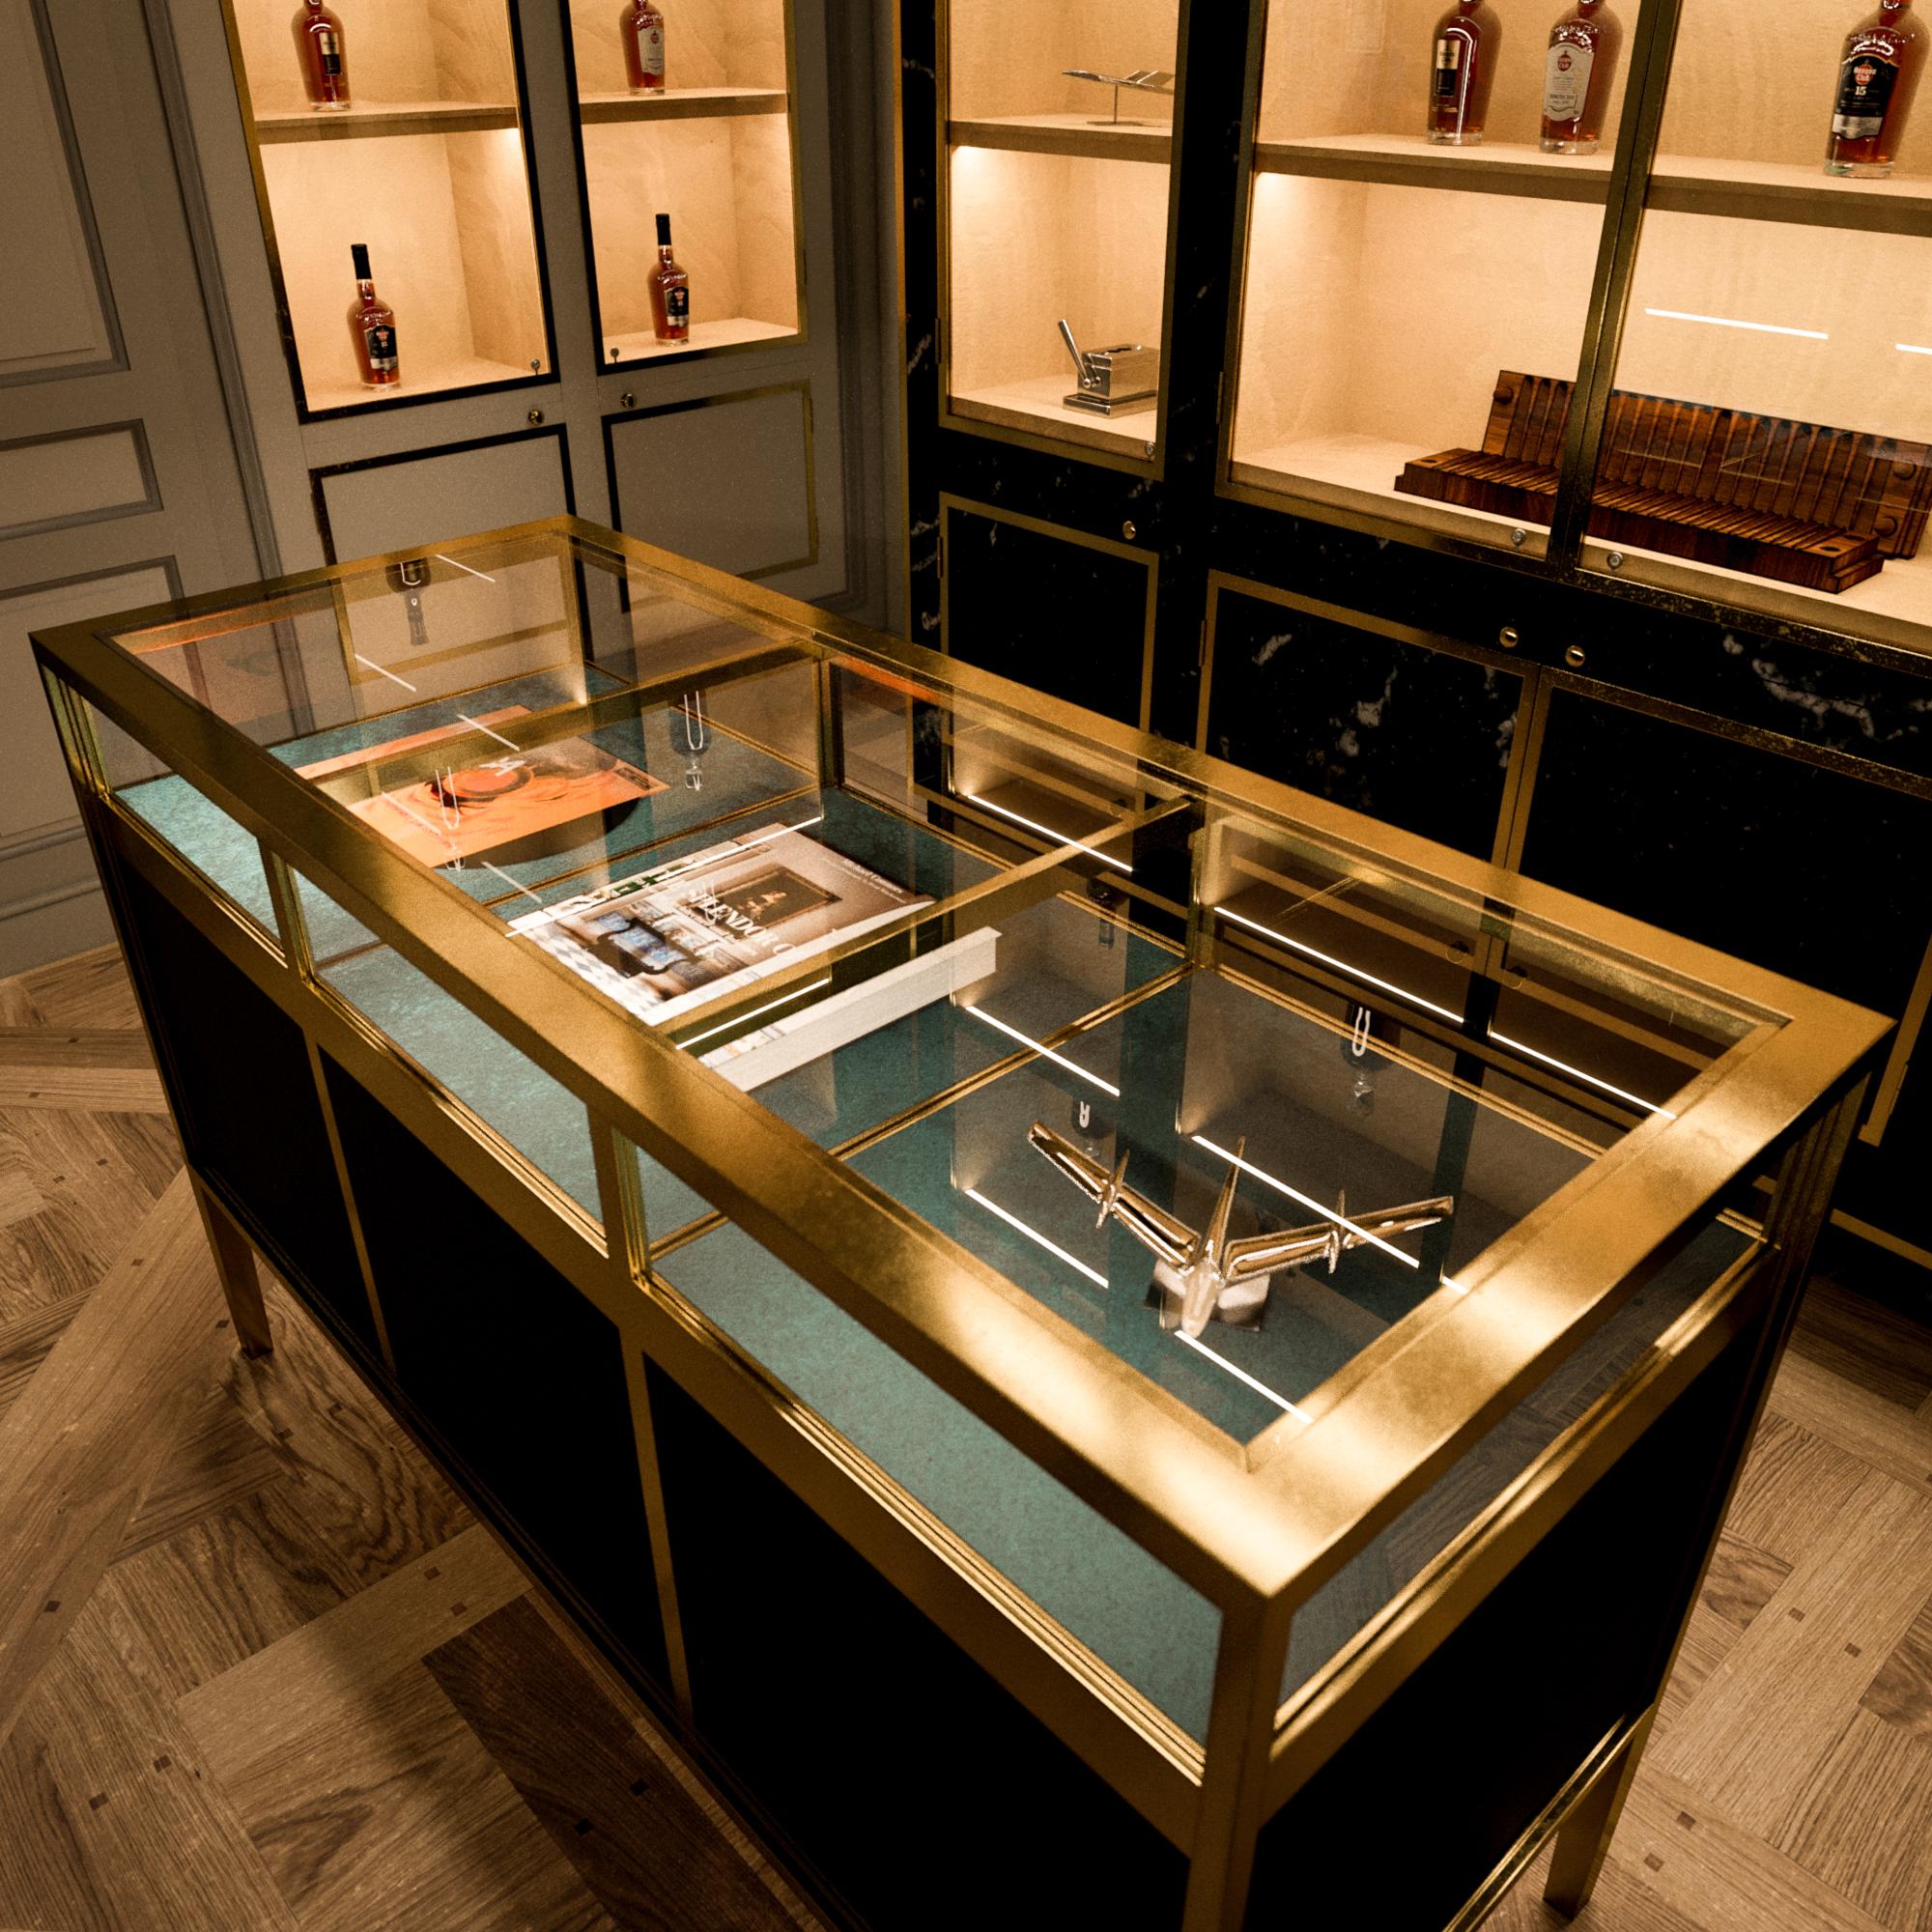 171222 - Display Cabinet.jpg